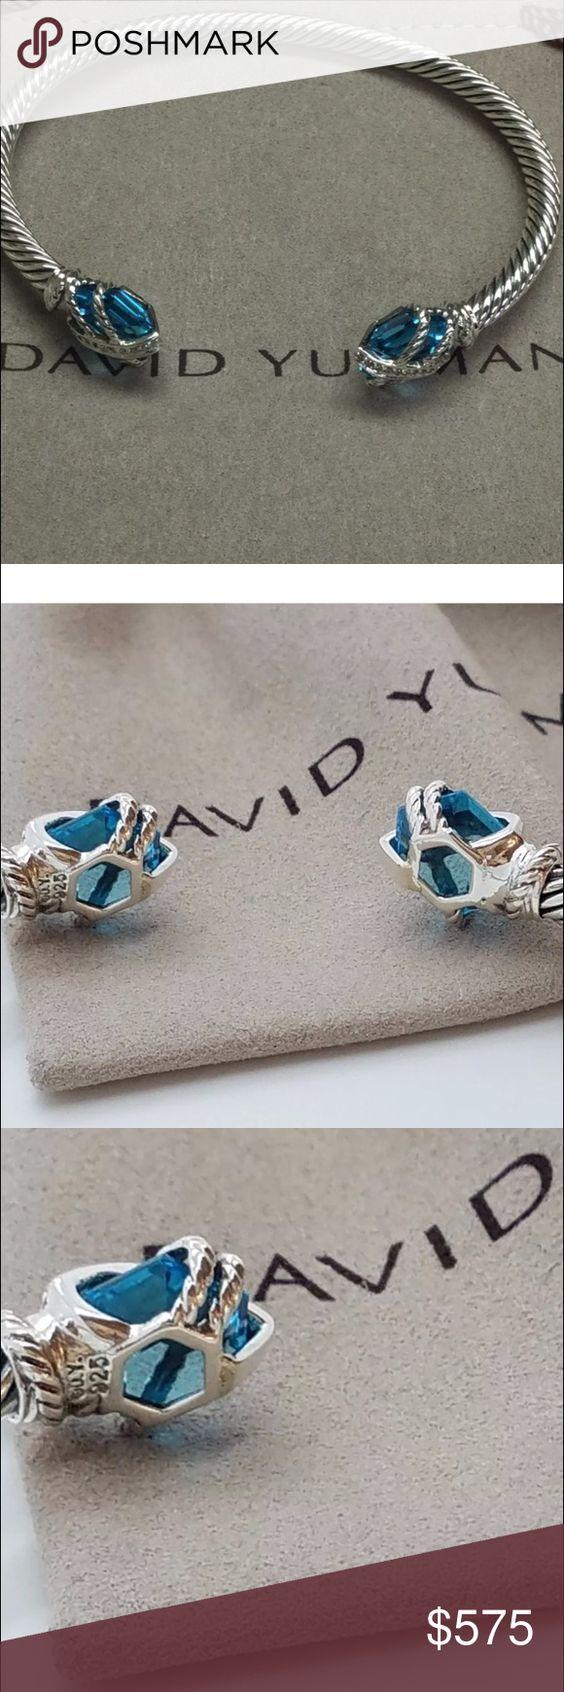 David Yurman cable wrap topaz bangle Size medium DY 925 with pouch and gift condition David Yurman Jewelry Bracelets